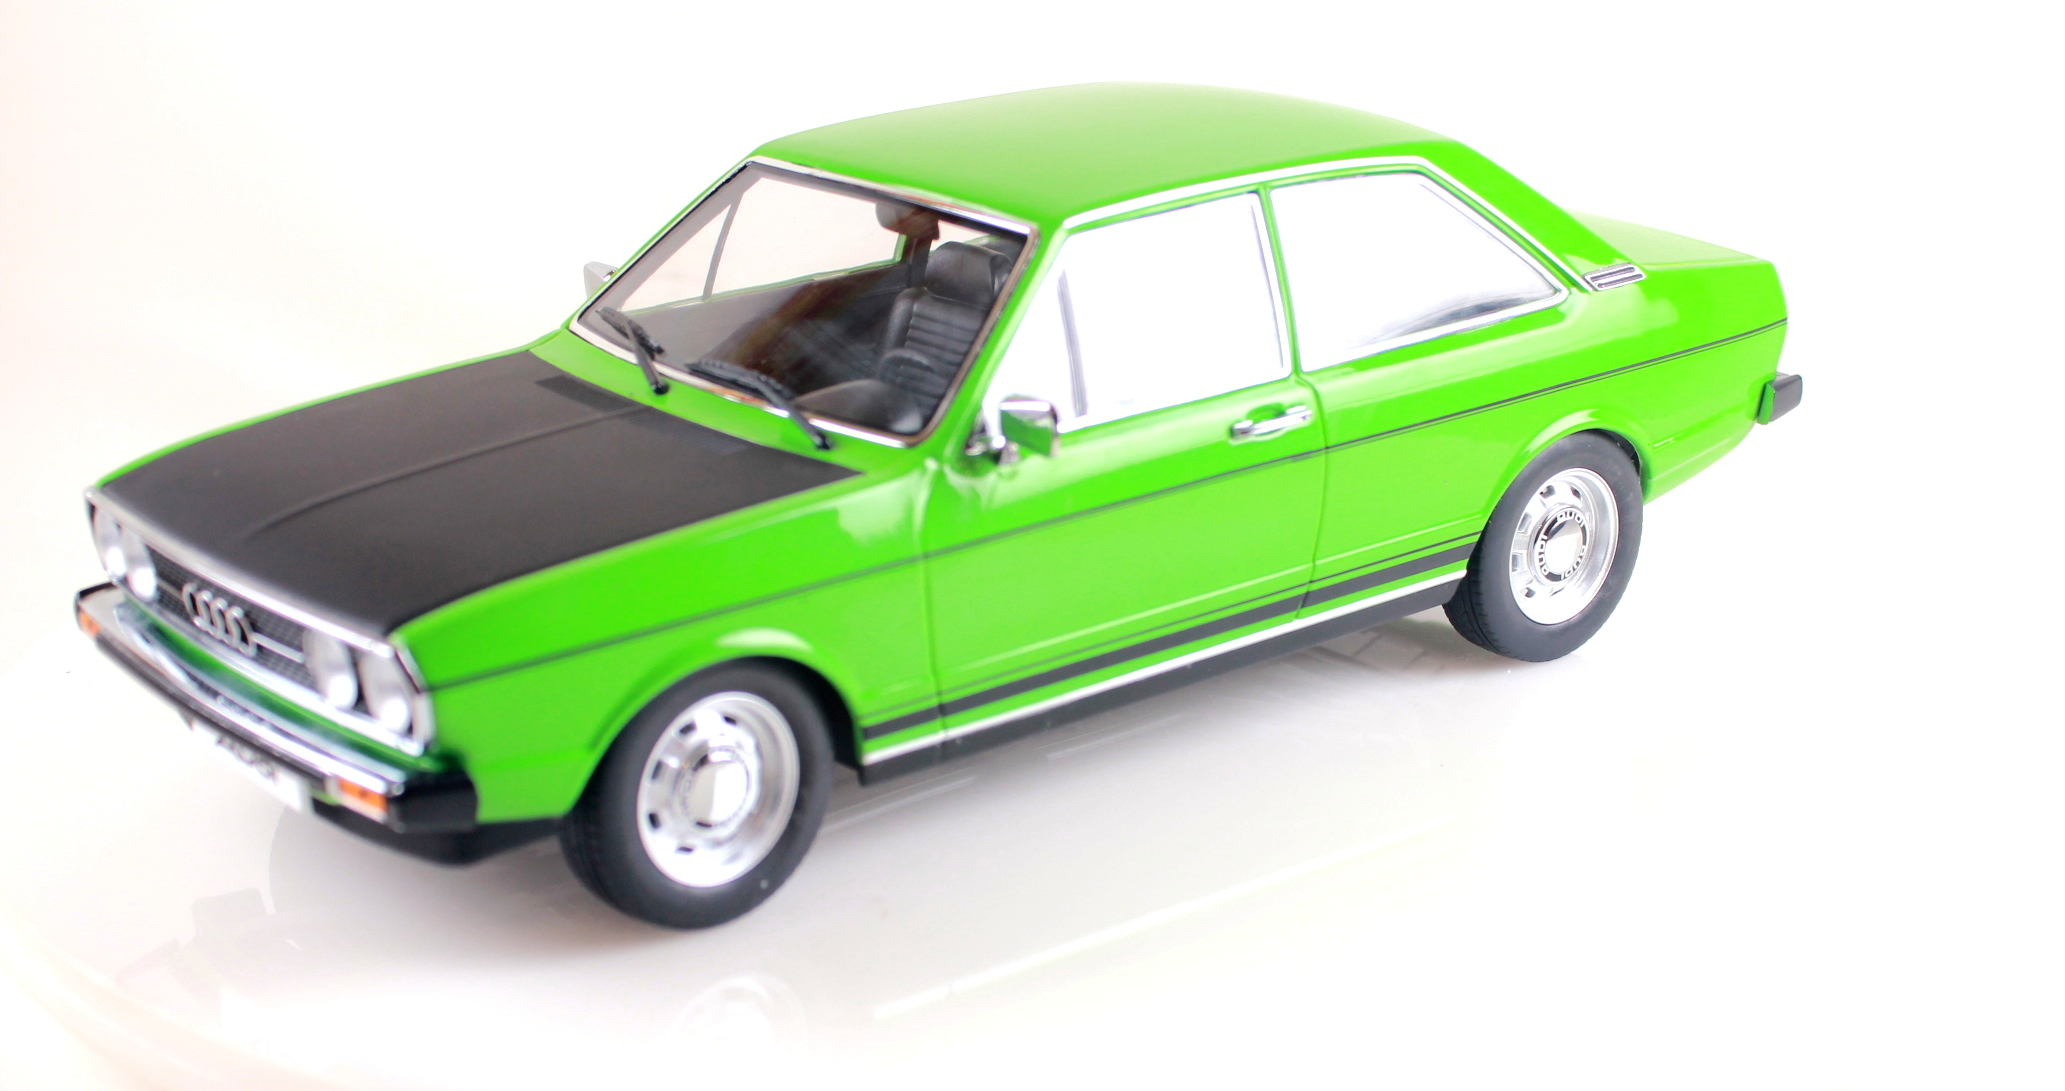 AUDI 80 GTE COUPE 1974 - Метални хоби колички за колекционери. Мащаби 1/18 1/24 1/43 1/64